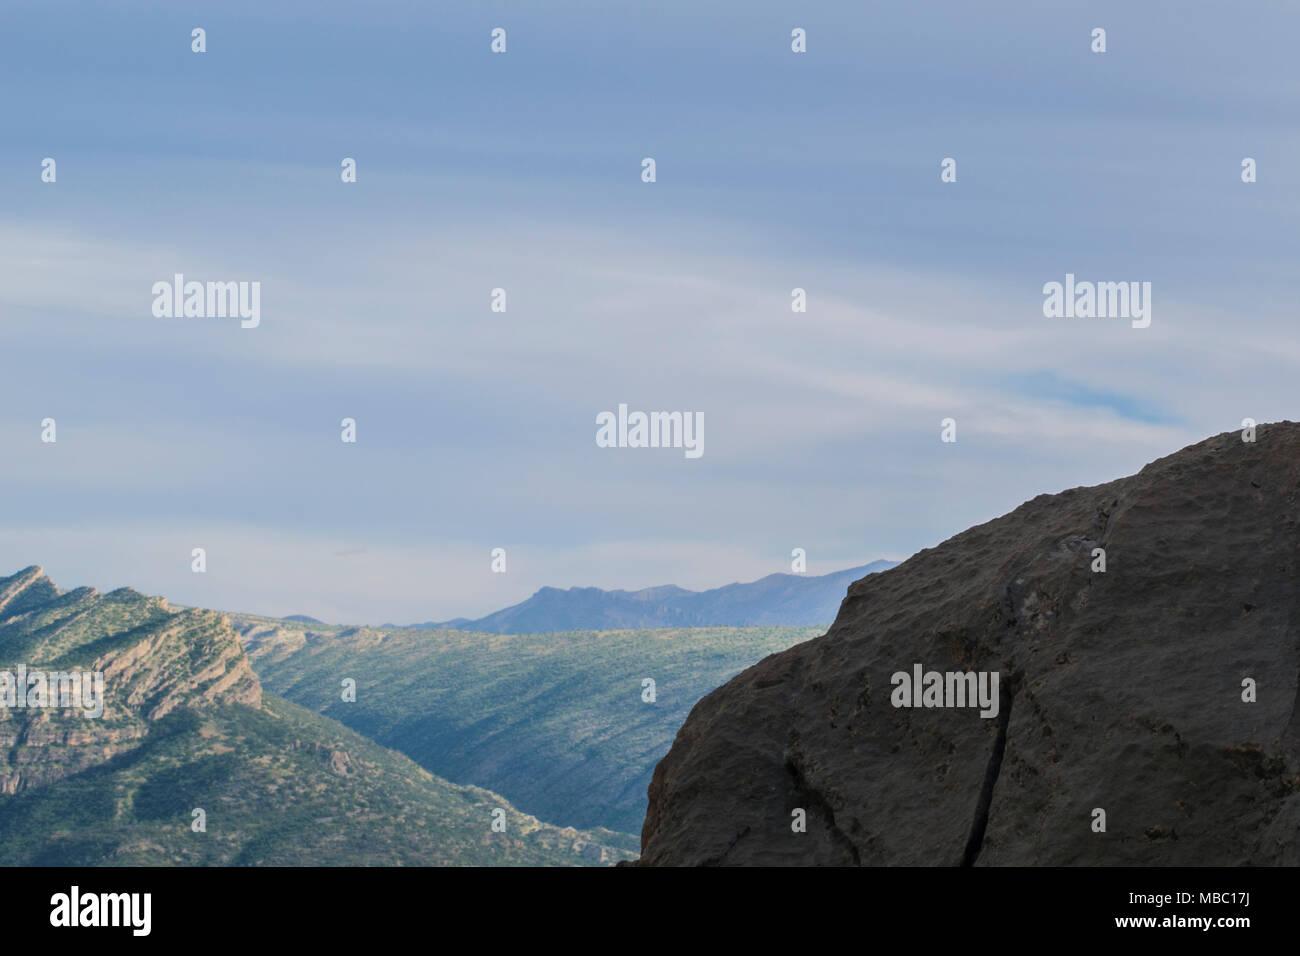 Piedras duras de montaña de Zagros Foto de stock